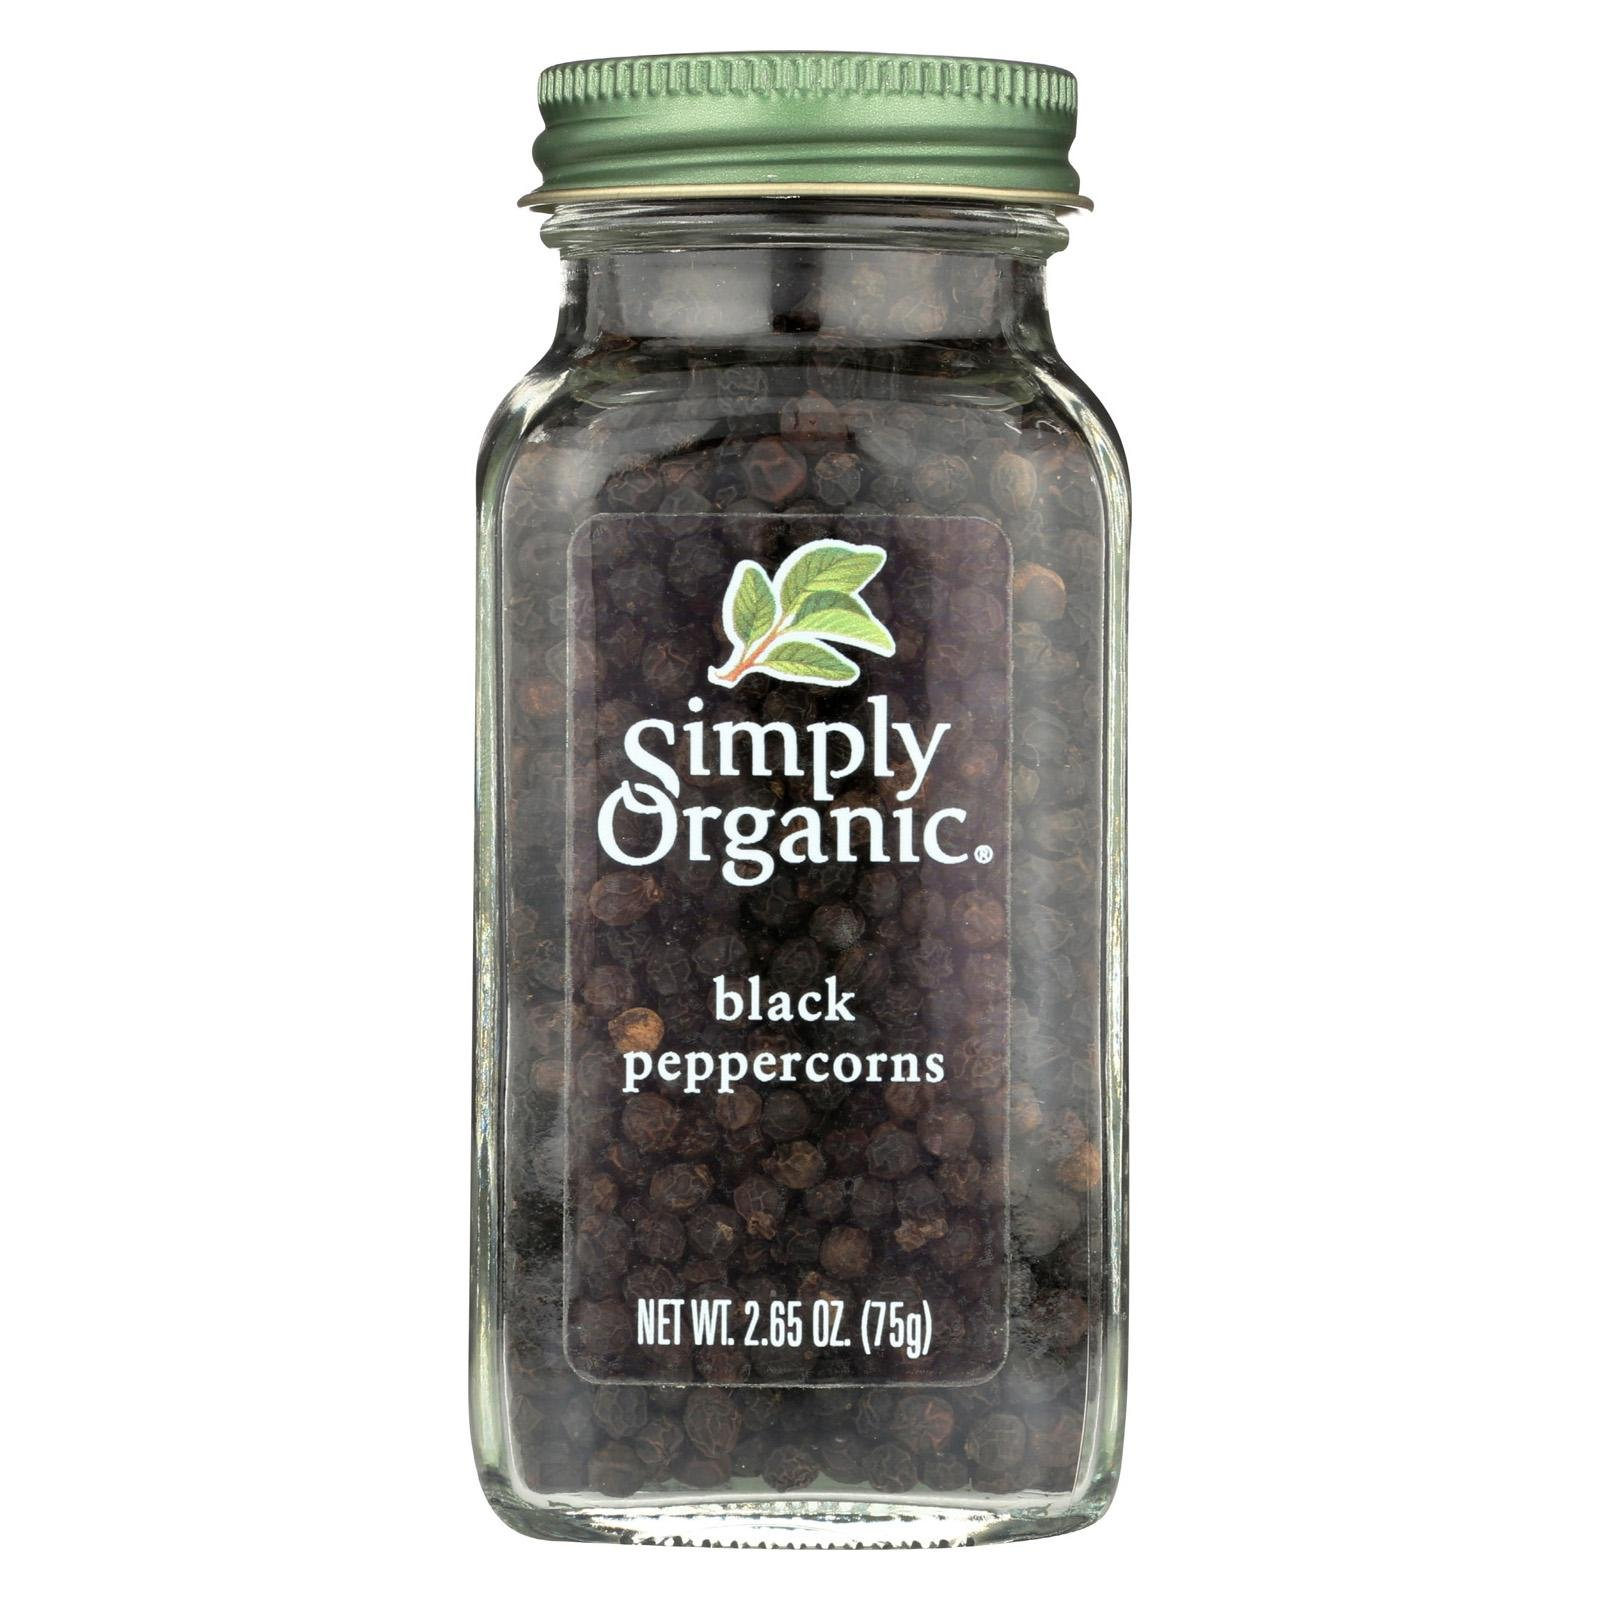 Simply Organic Black Whole Peppercorns Seasoning, 2.65 Ounce - 6 per case.